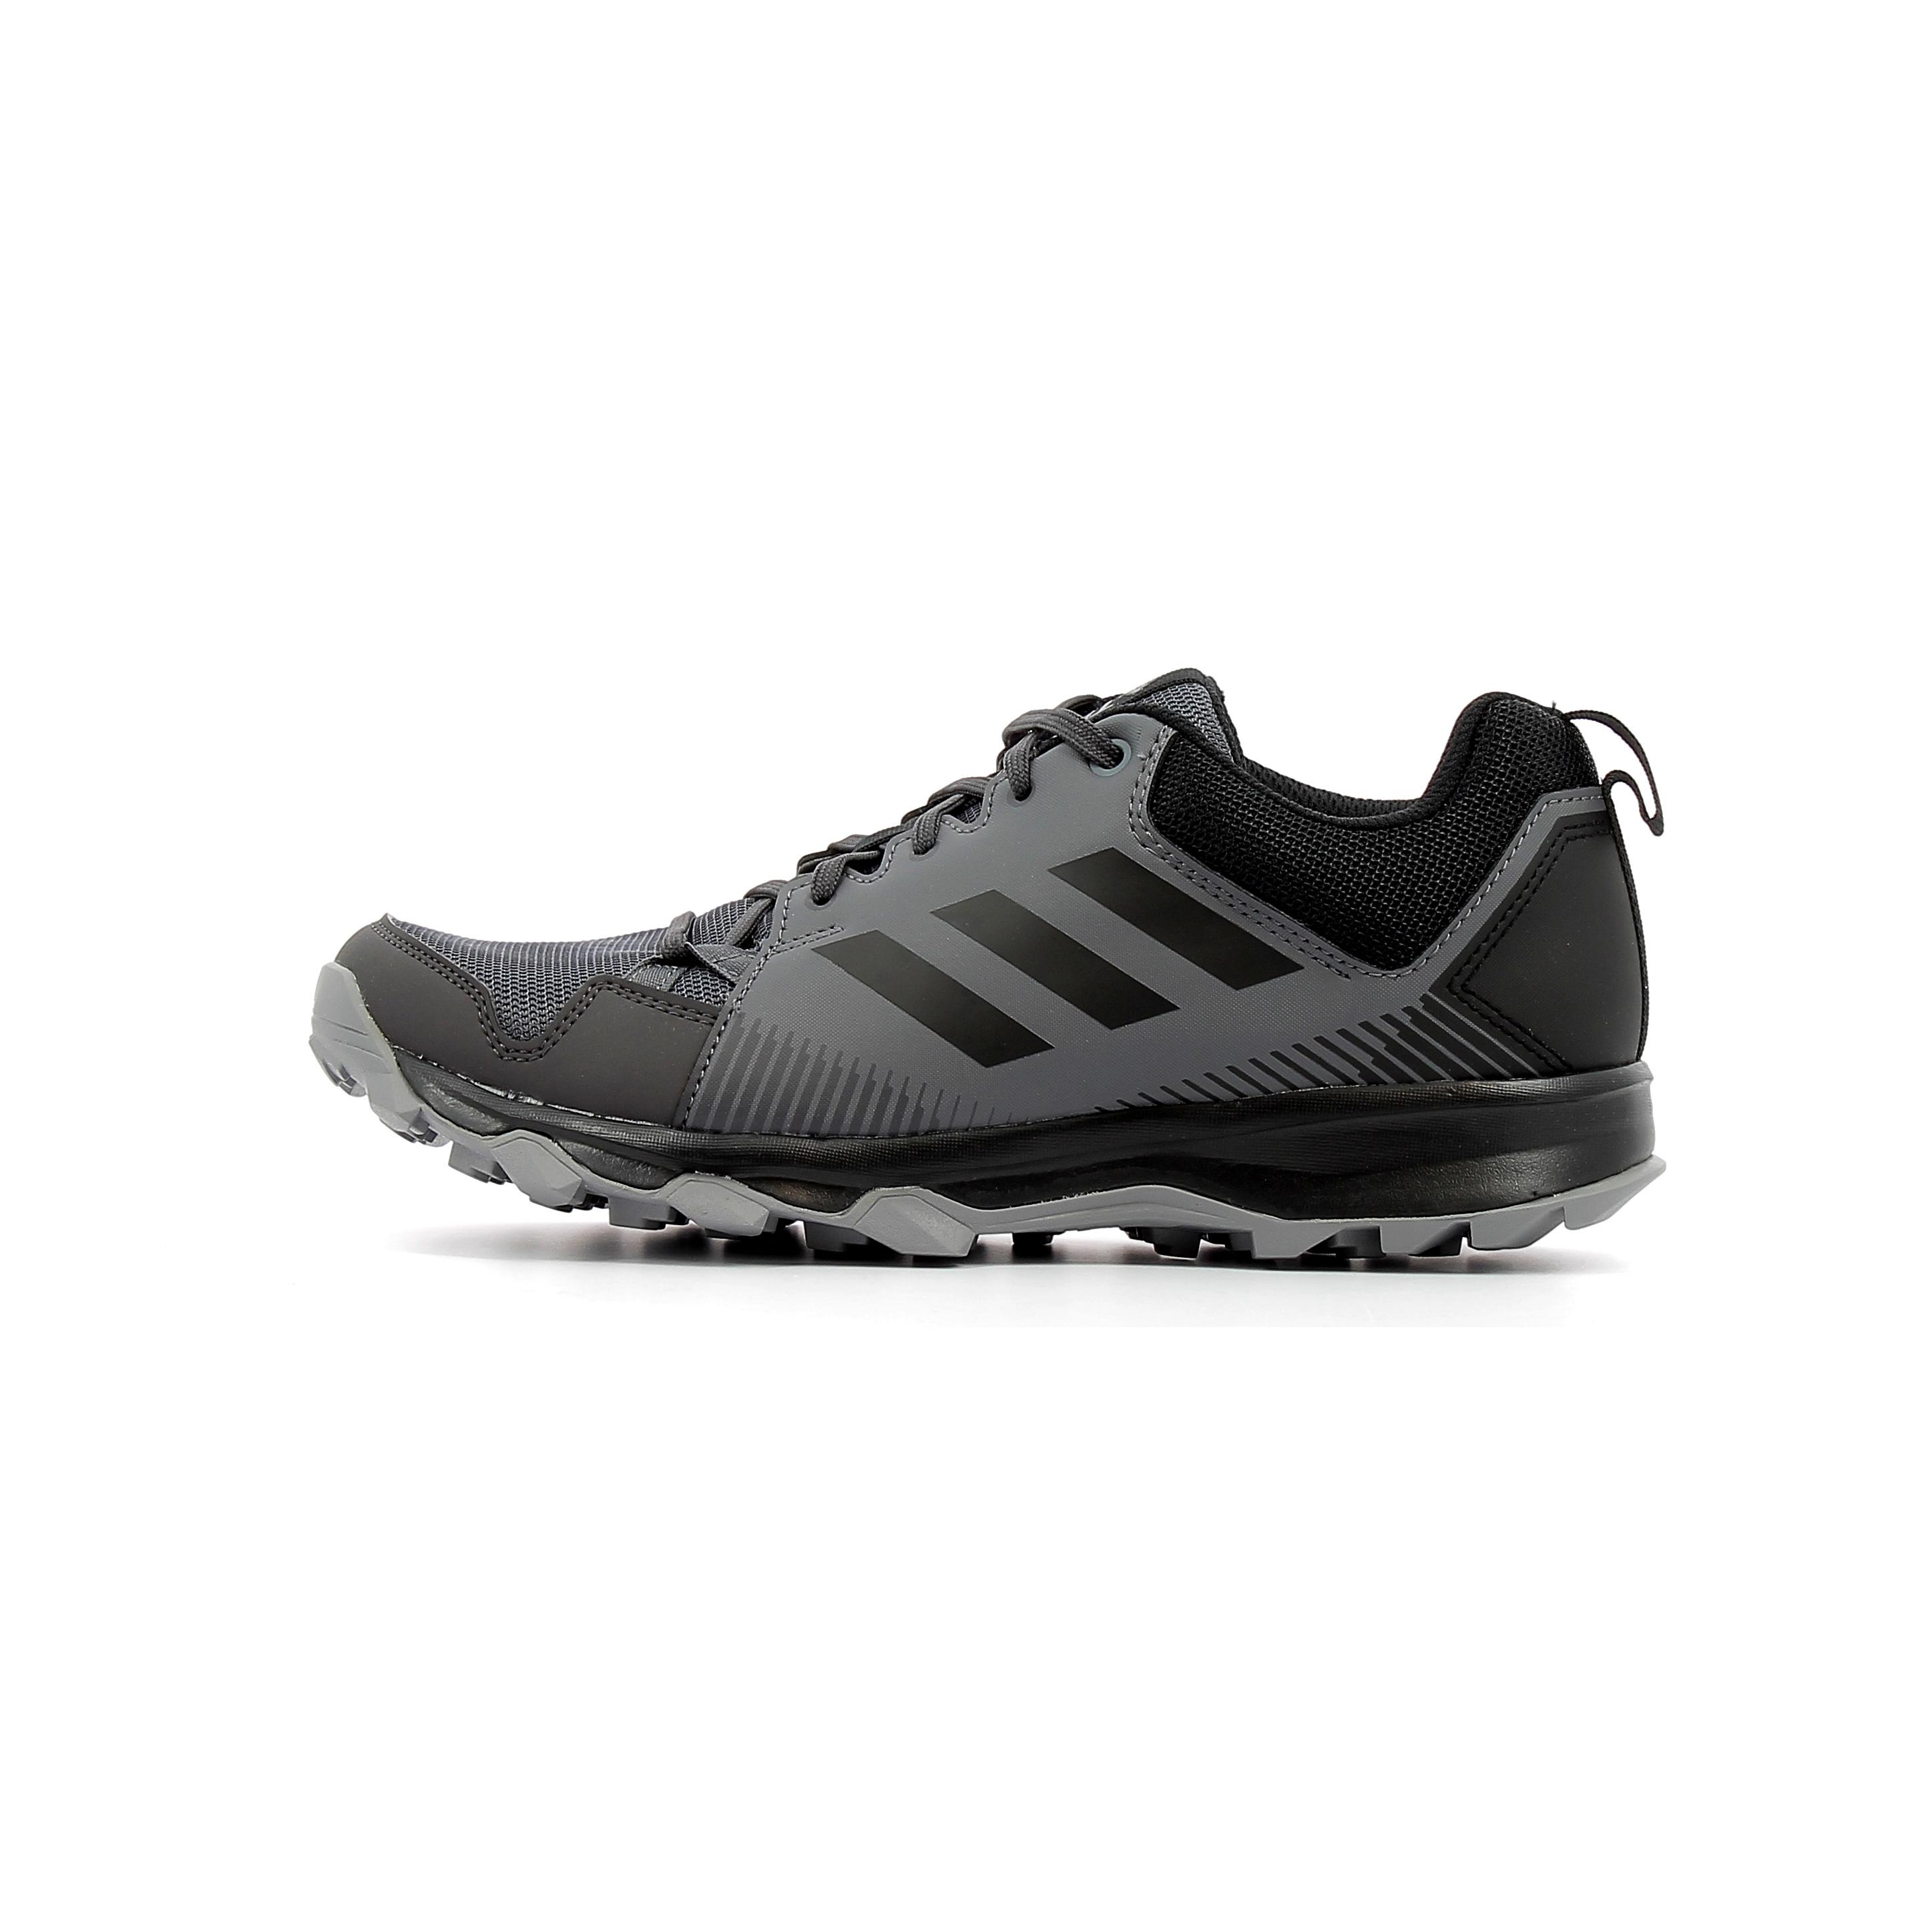 online store e63cc 8bf9d Chaussures de Trail   Rando Adidas Performance Terrex Tracerocker Femme    Alltricks.com